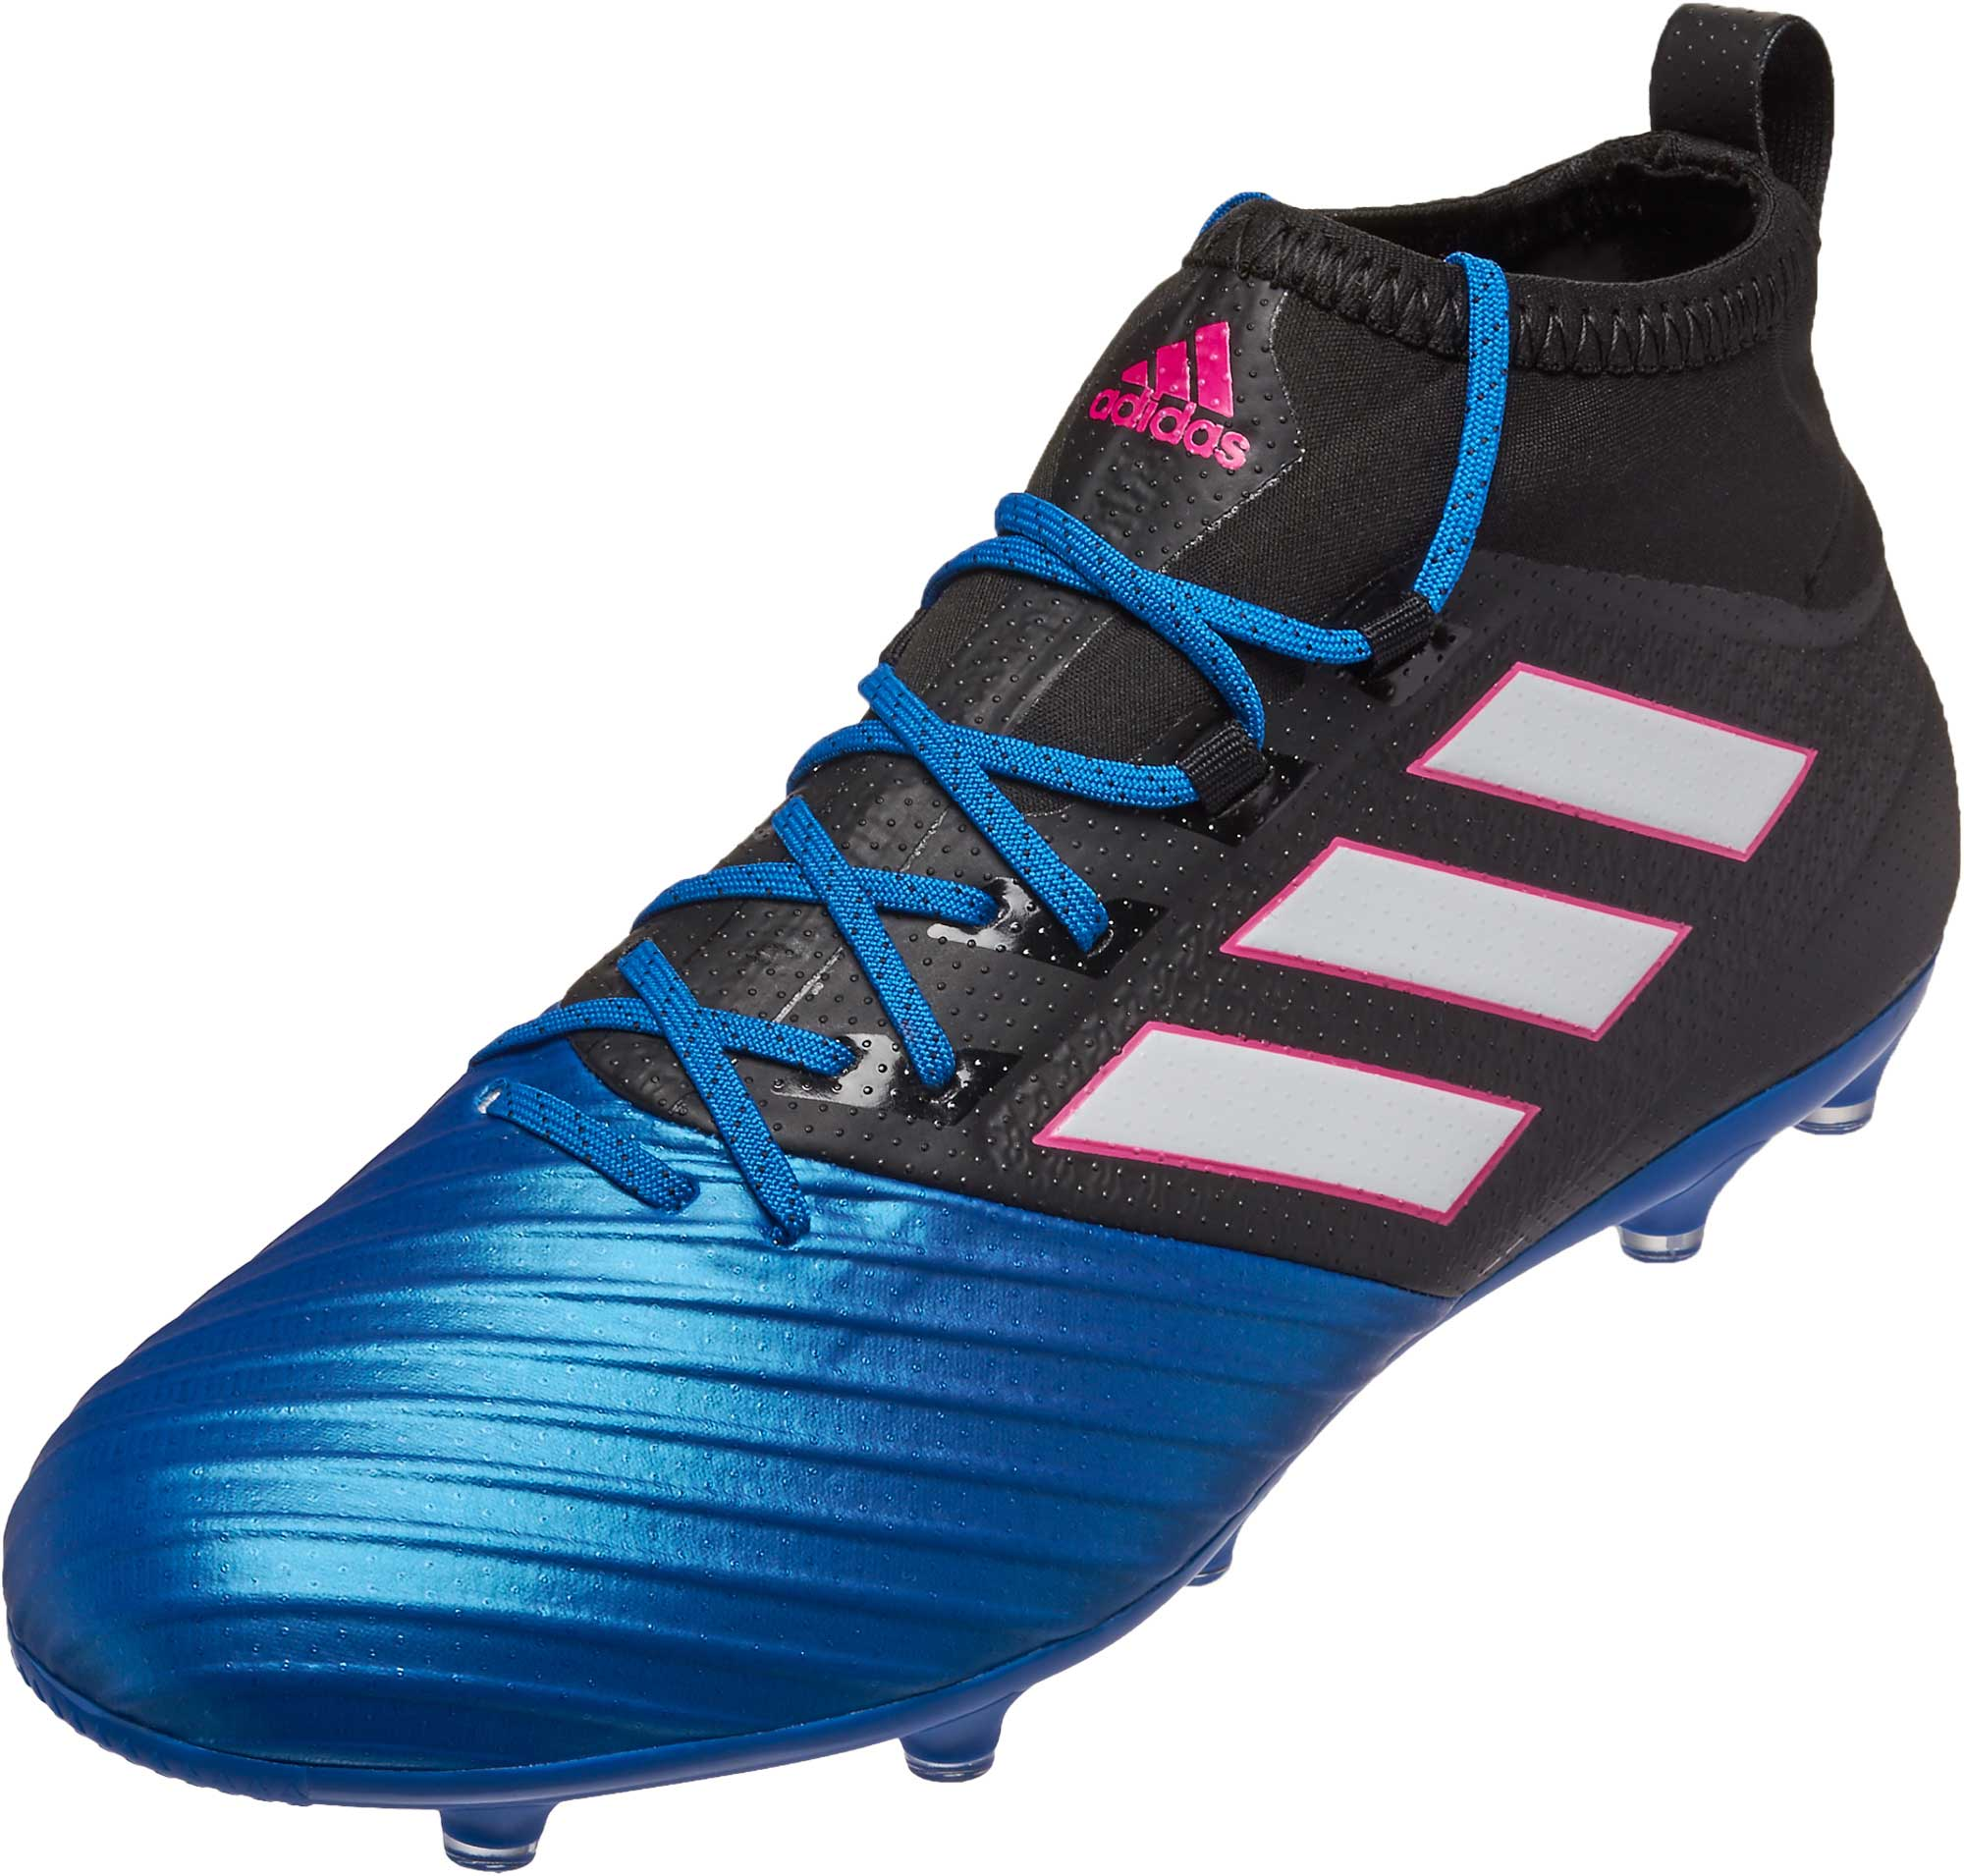 adidas ACE 17.2 Primemesh FG Soccer Cleats - Black